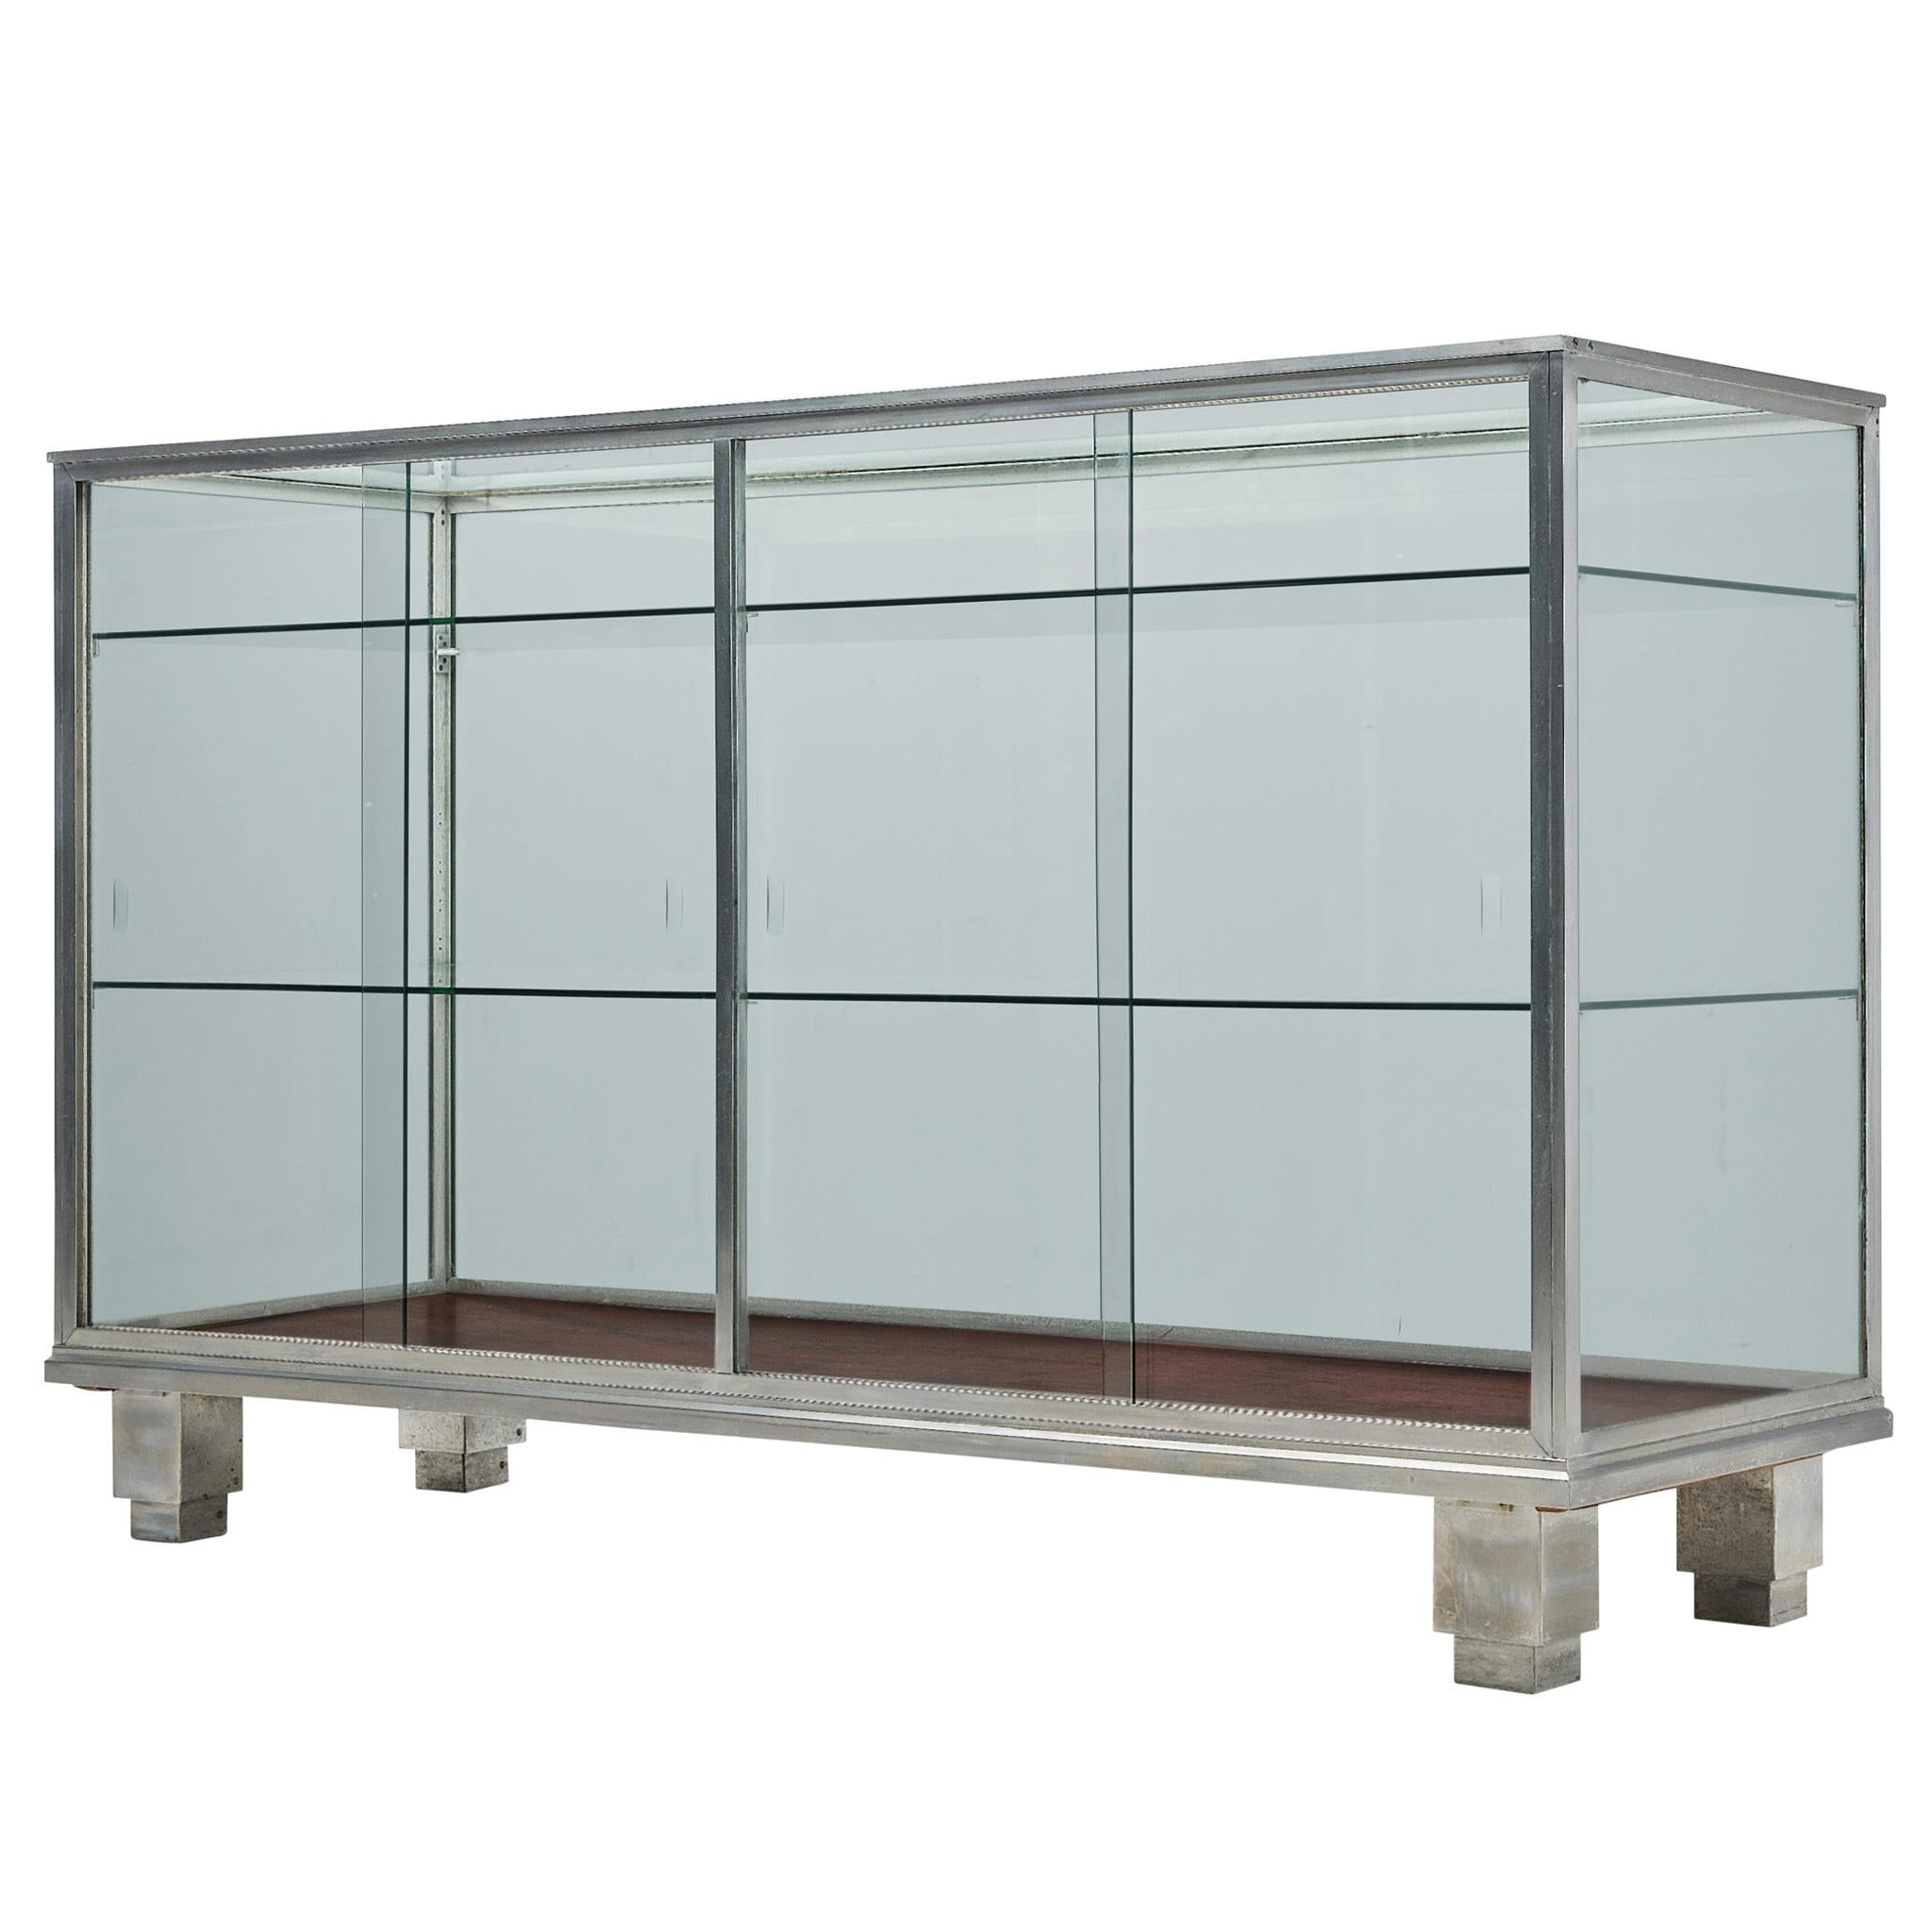 Vitrine in Aluminum and Glass